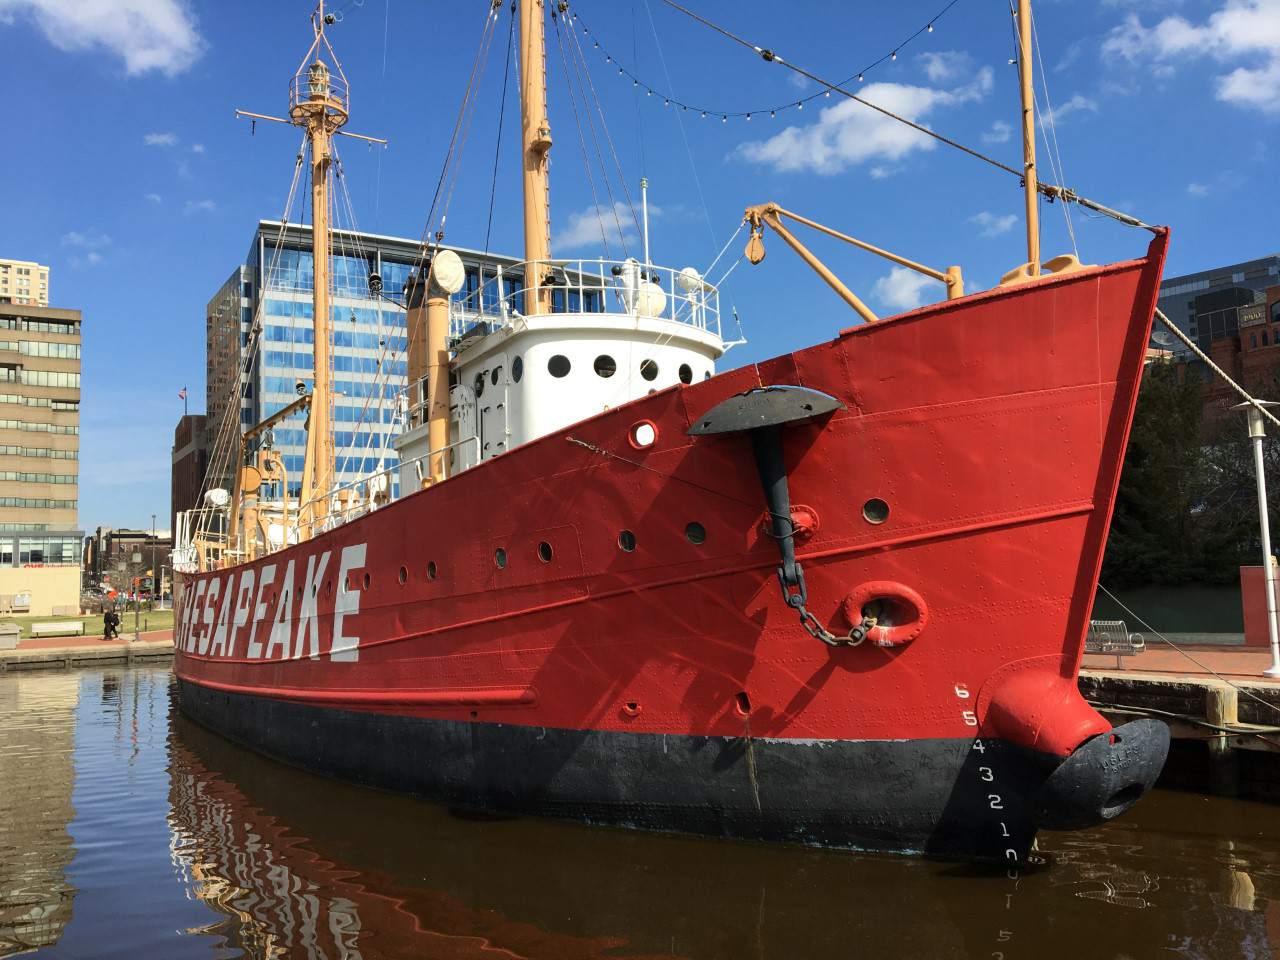 Chesapeake boat